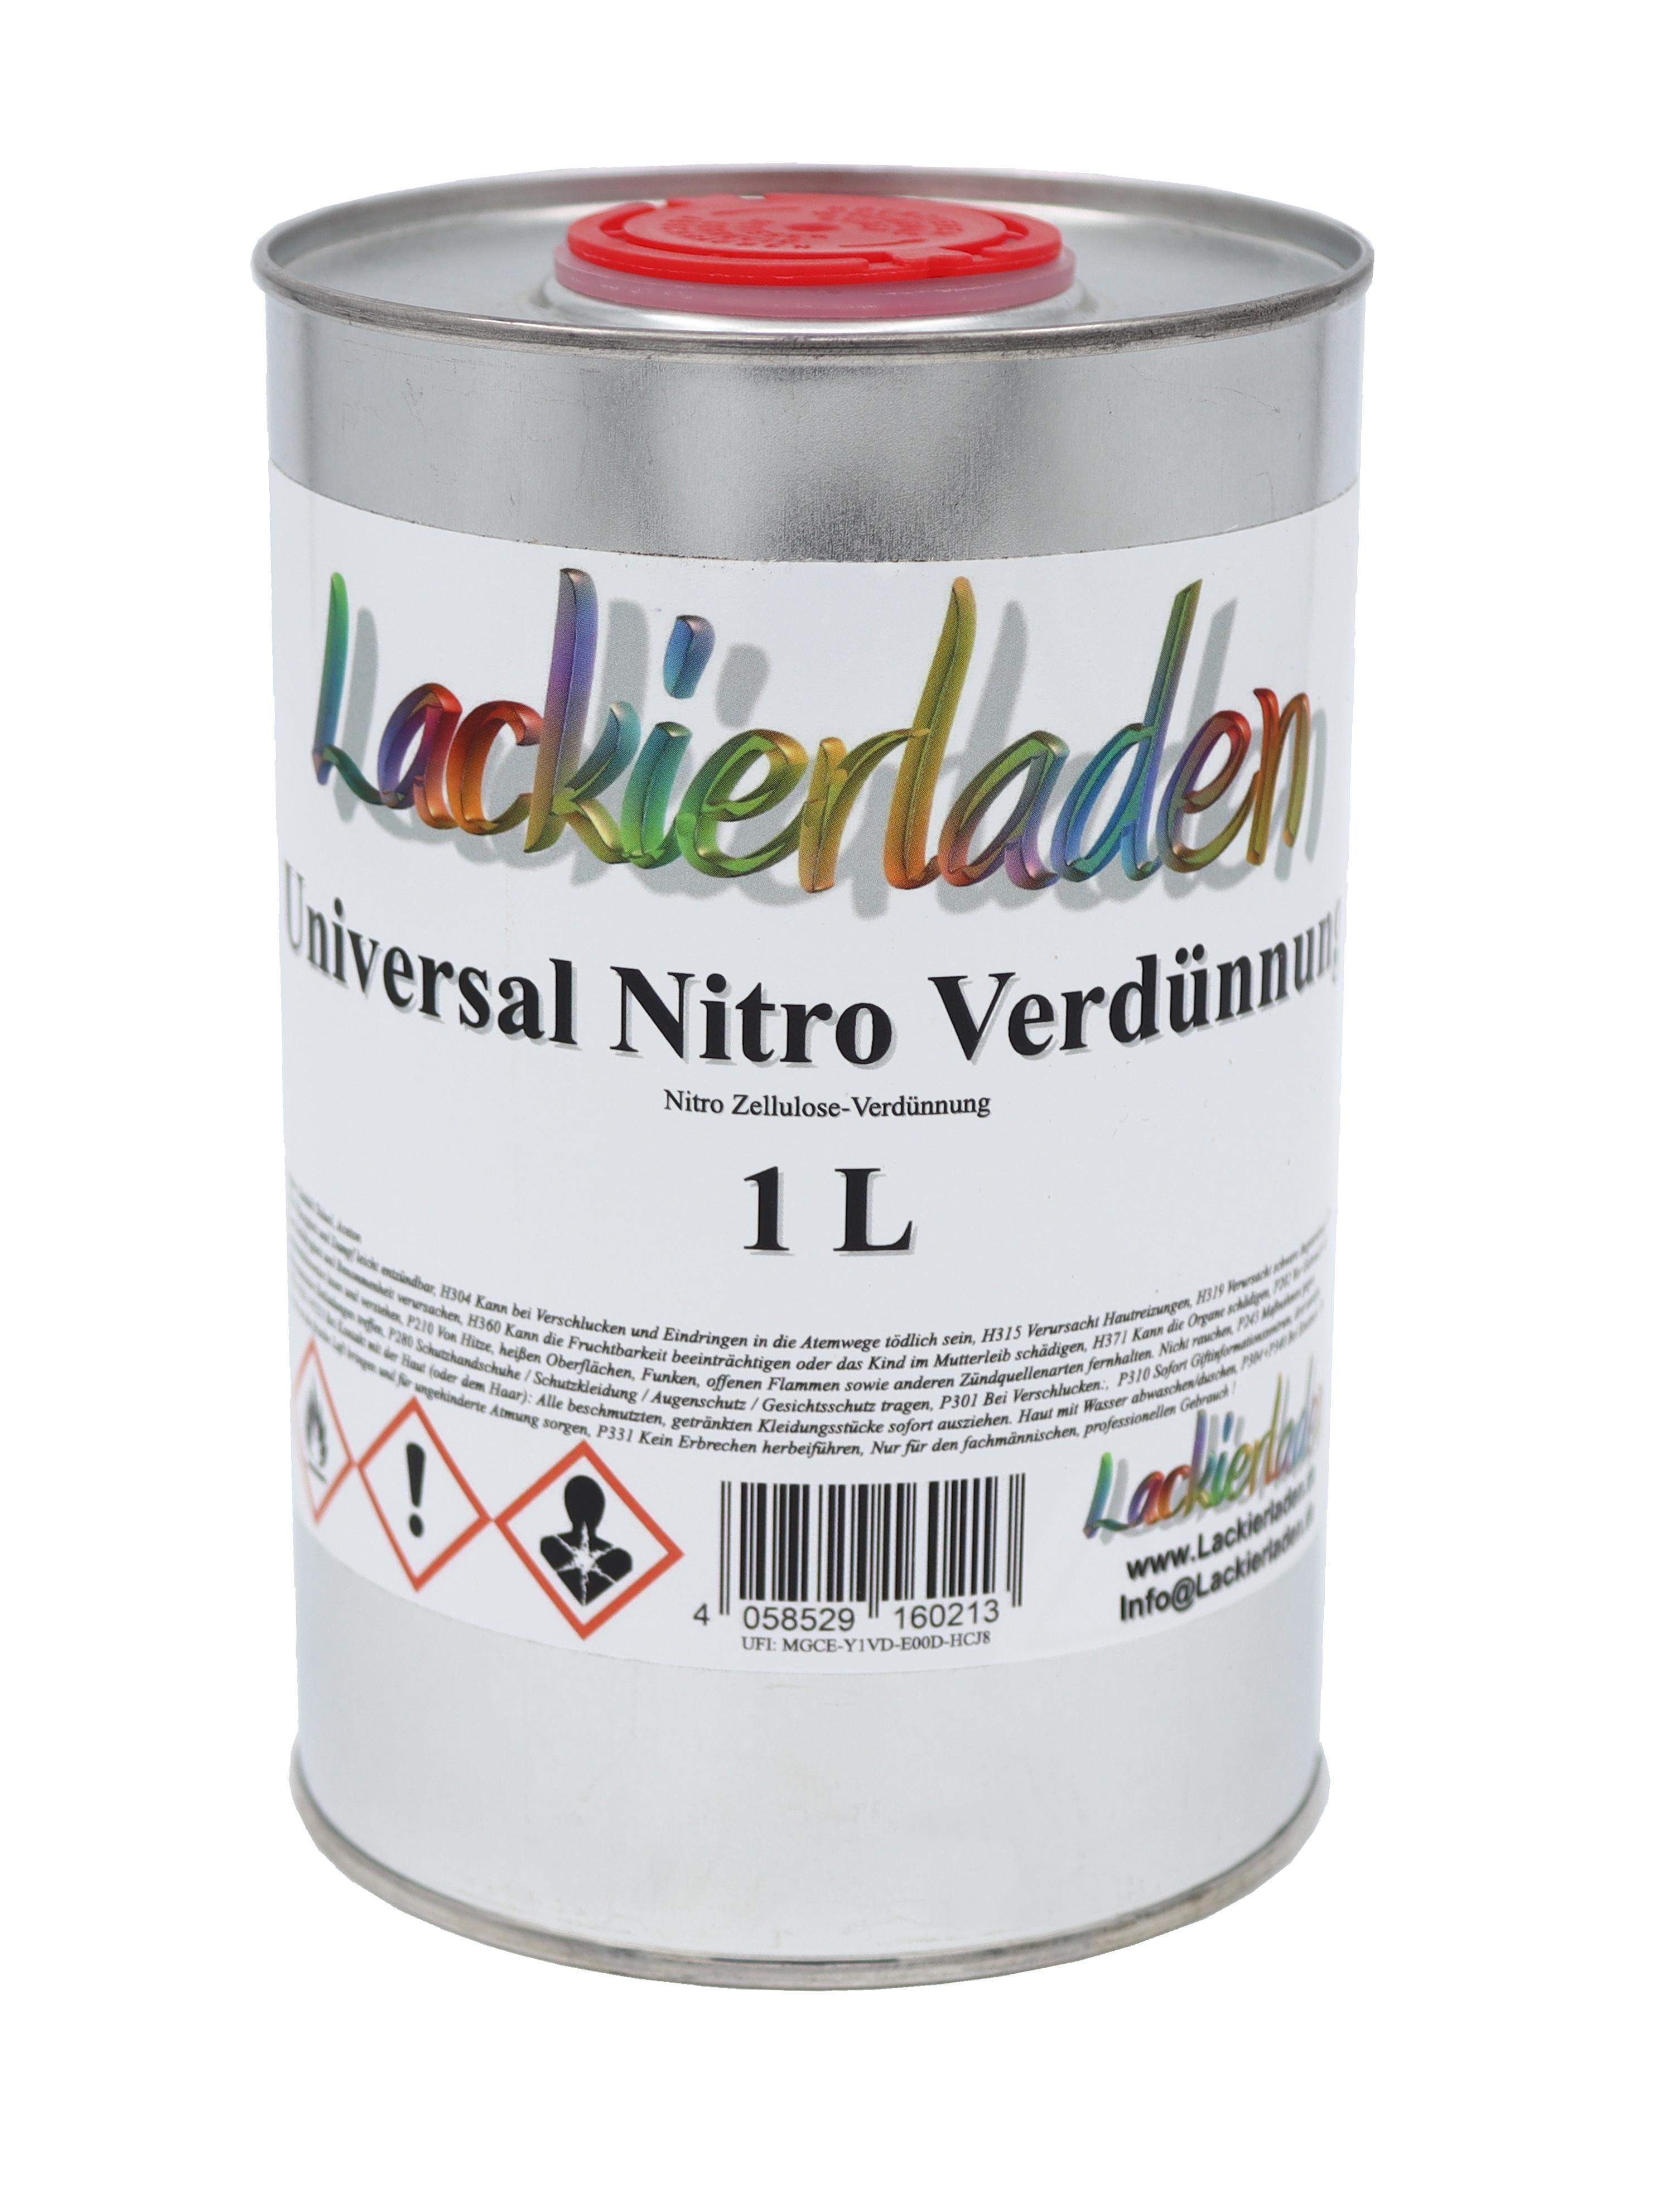 Universal Nitro Verdünnung 1 L